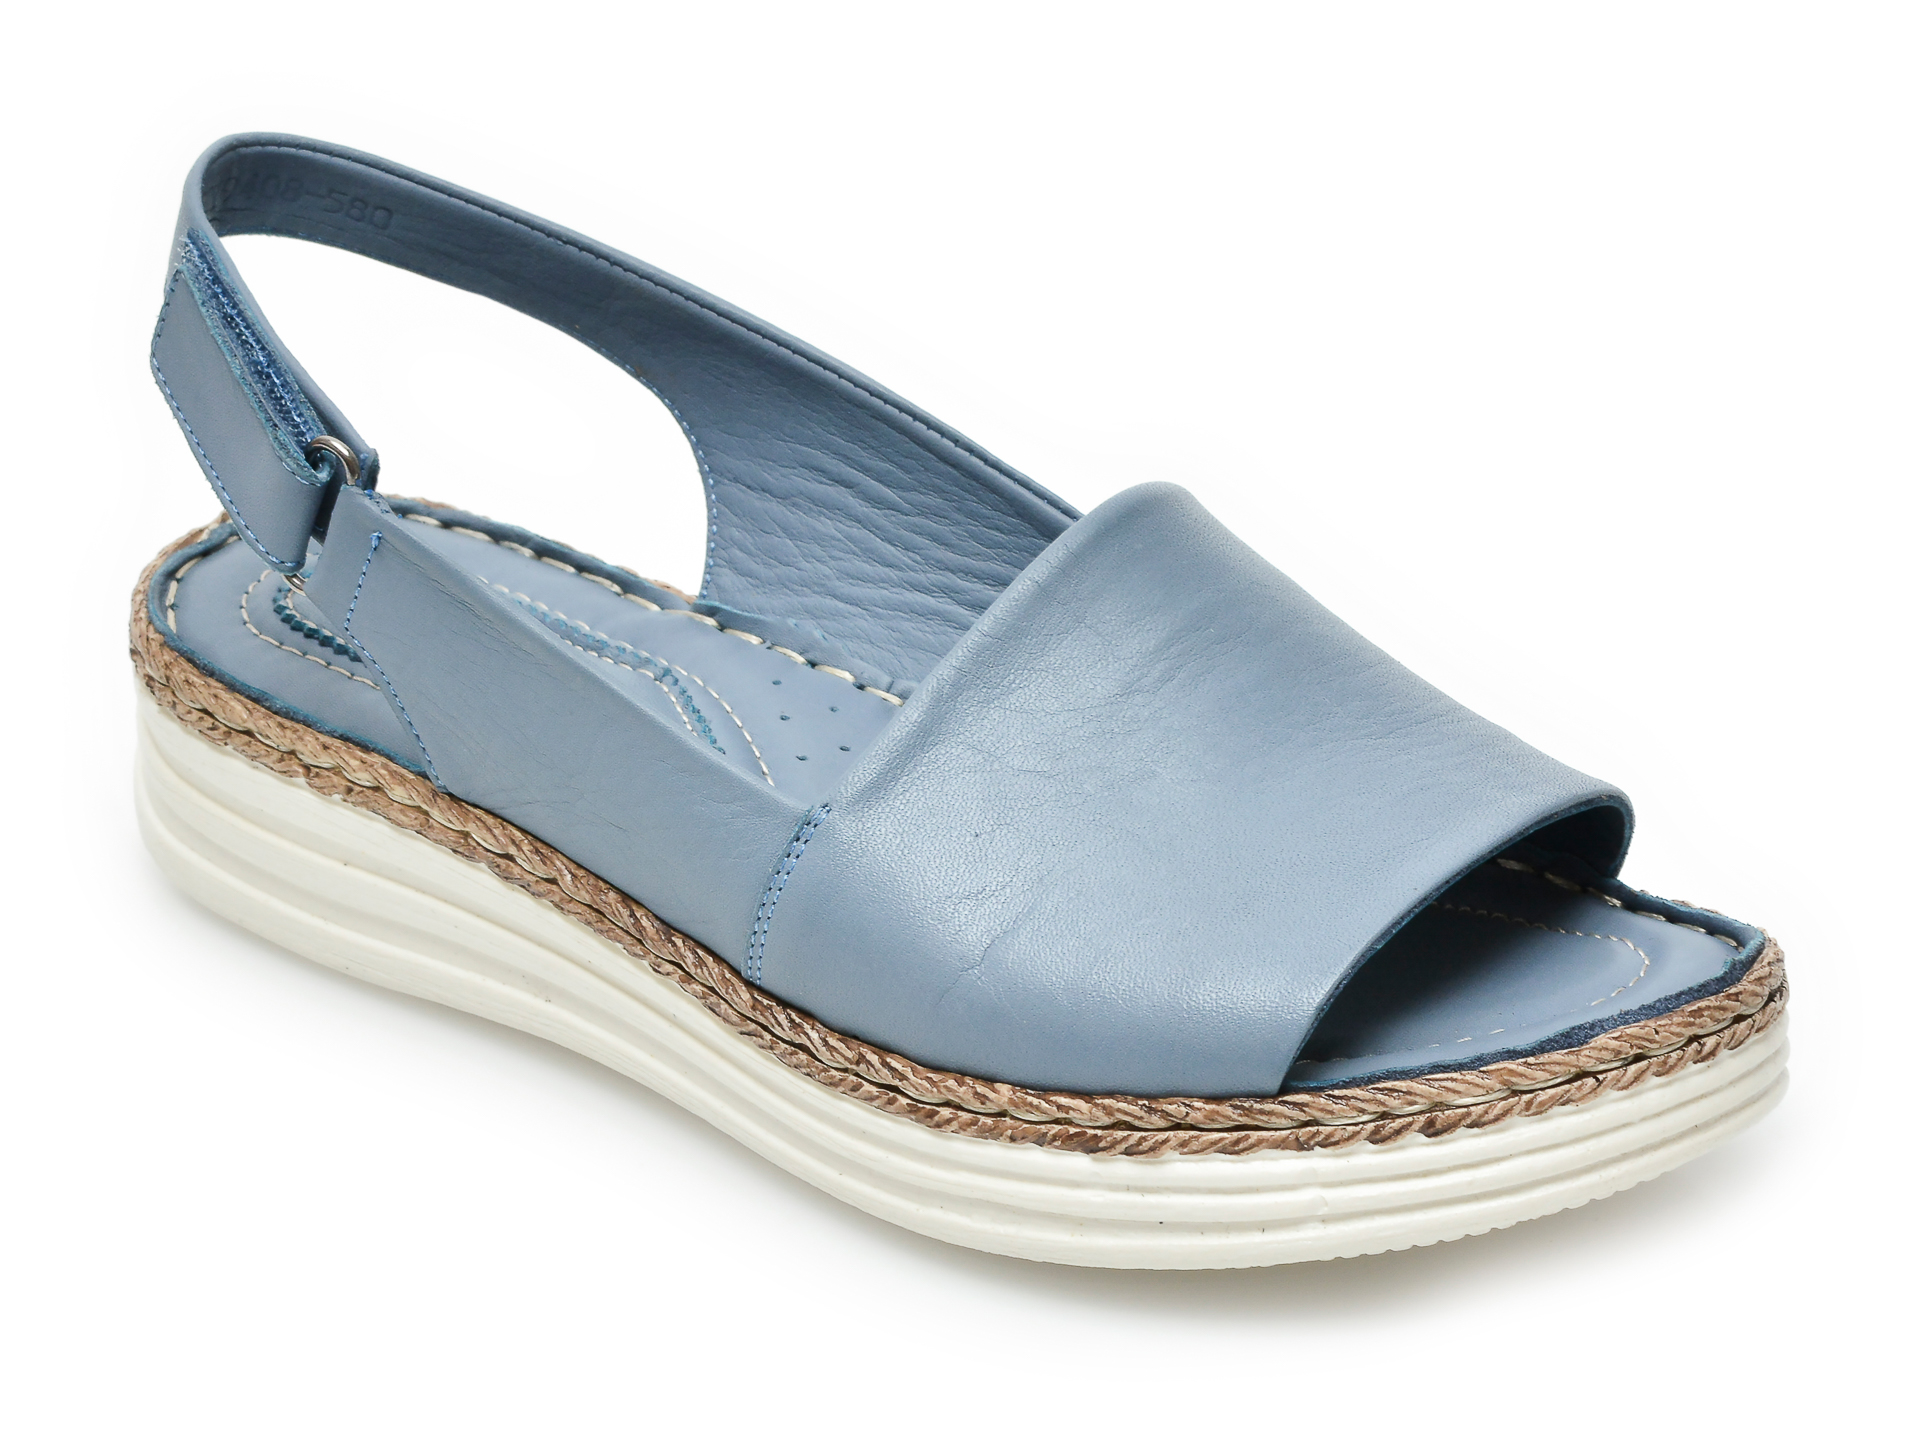 Sandale FLAVIA PASSINI albastre, 9408580, din piele naturala imagine otter.ro 2021